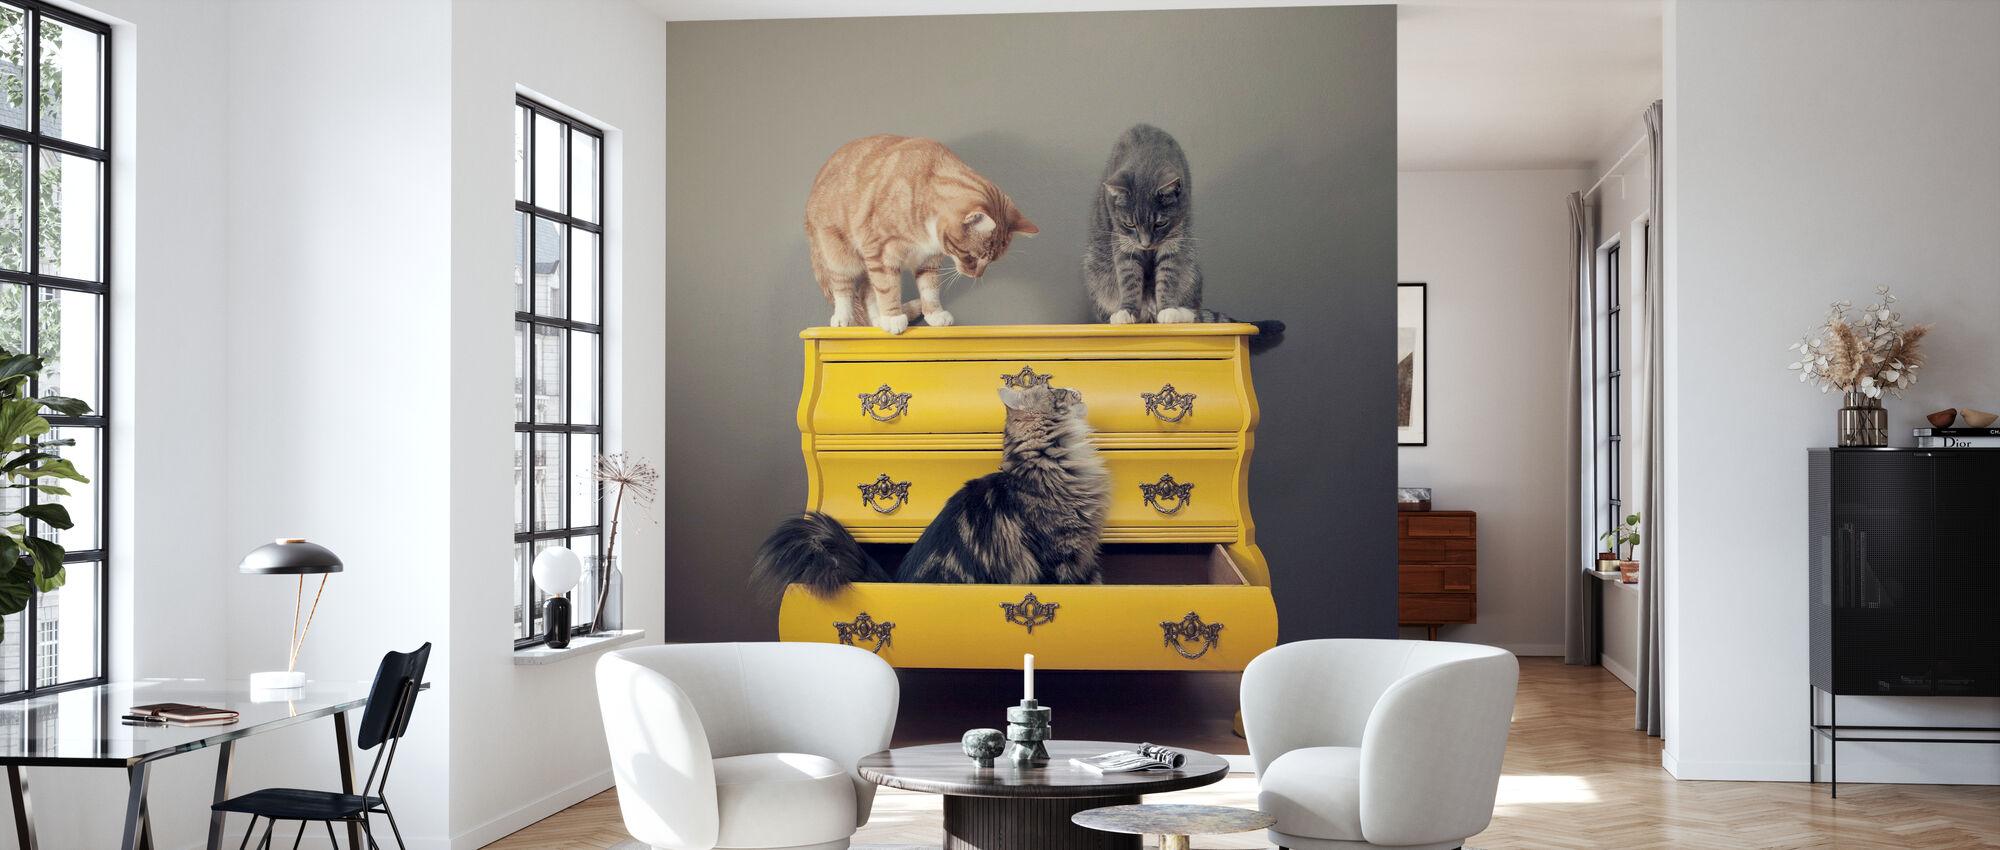 Meeting in a Yellow Bureau - Wallpaper - Living Room